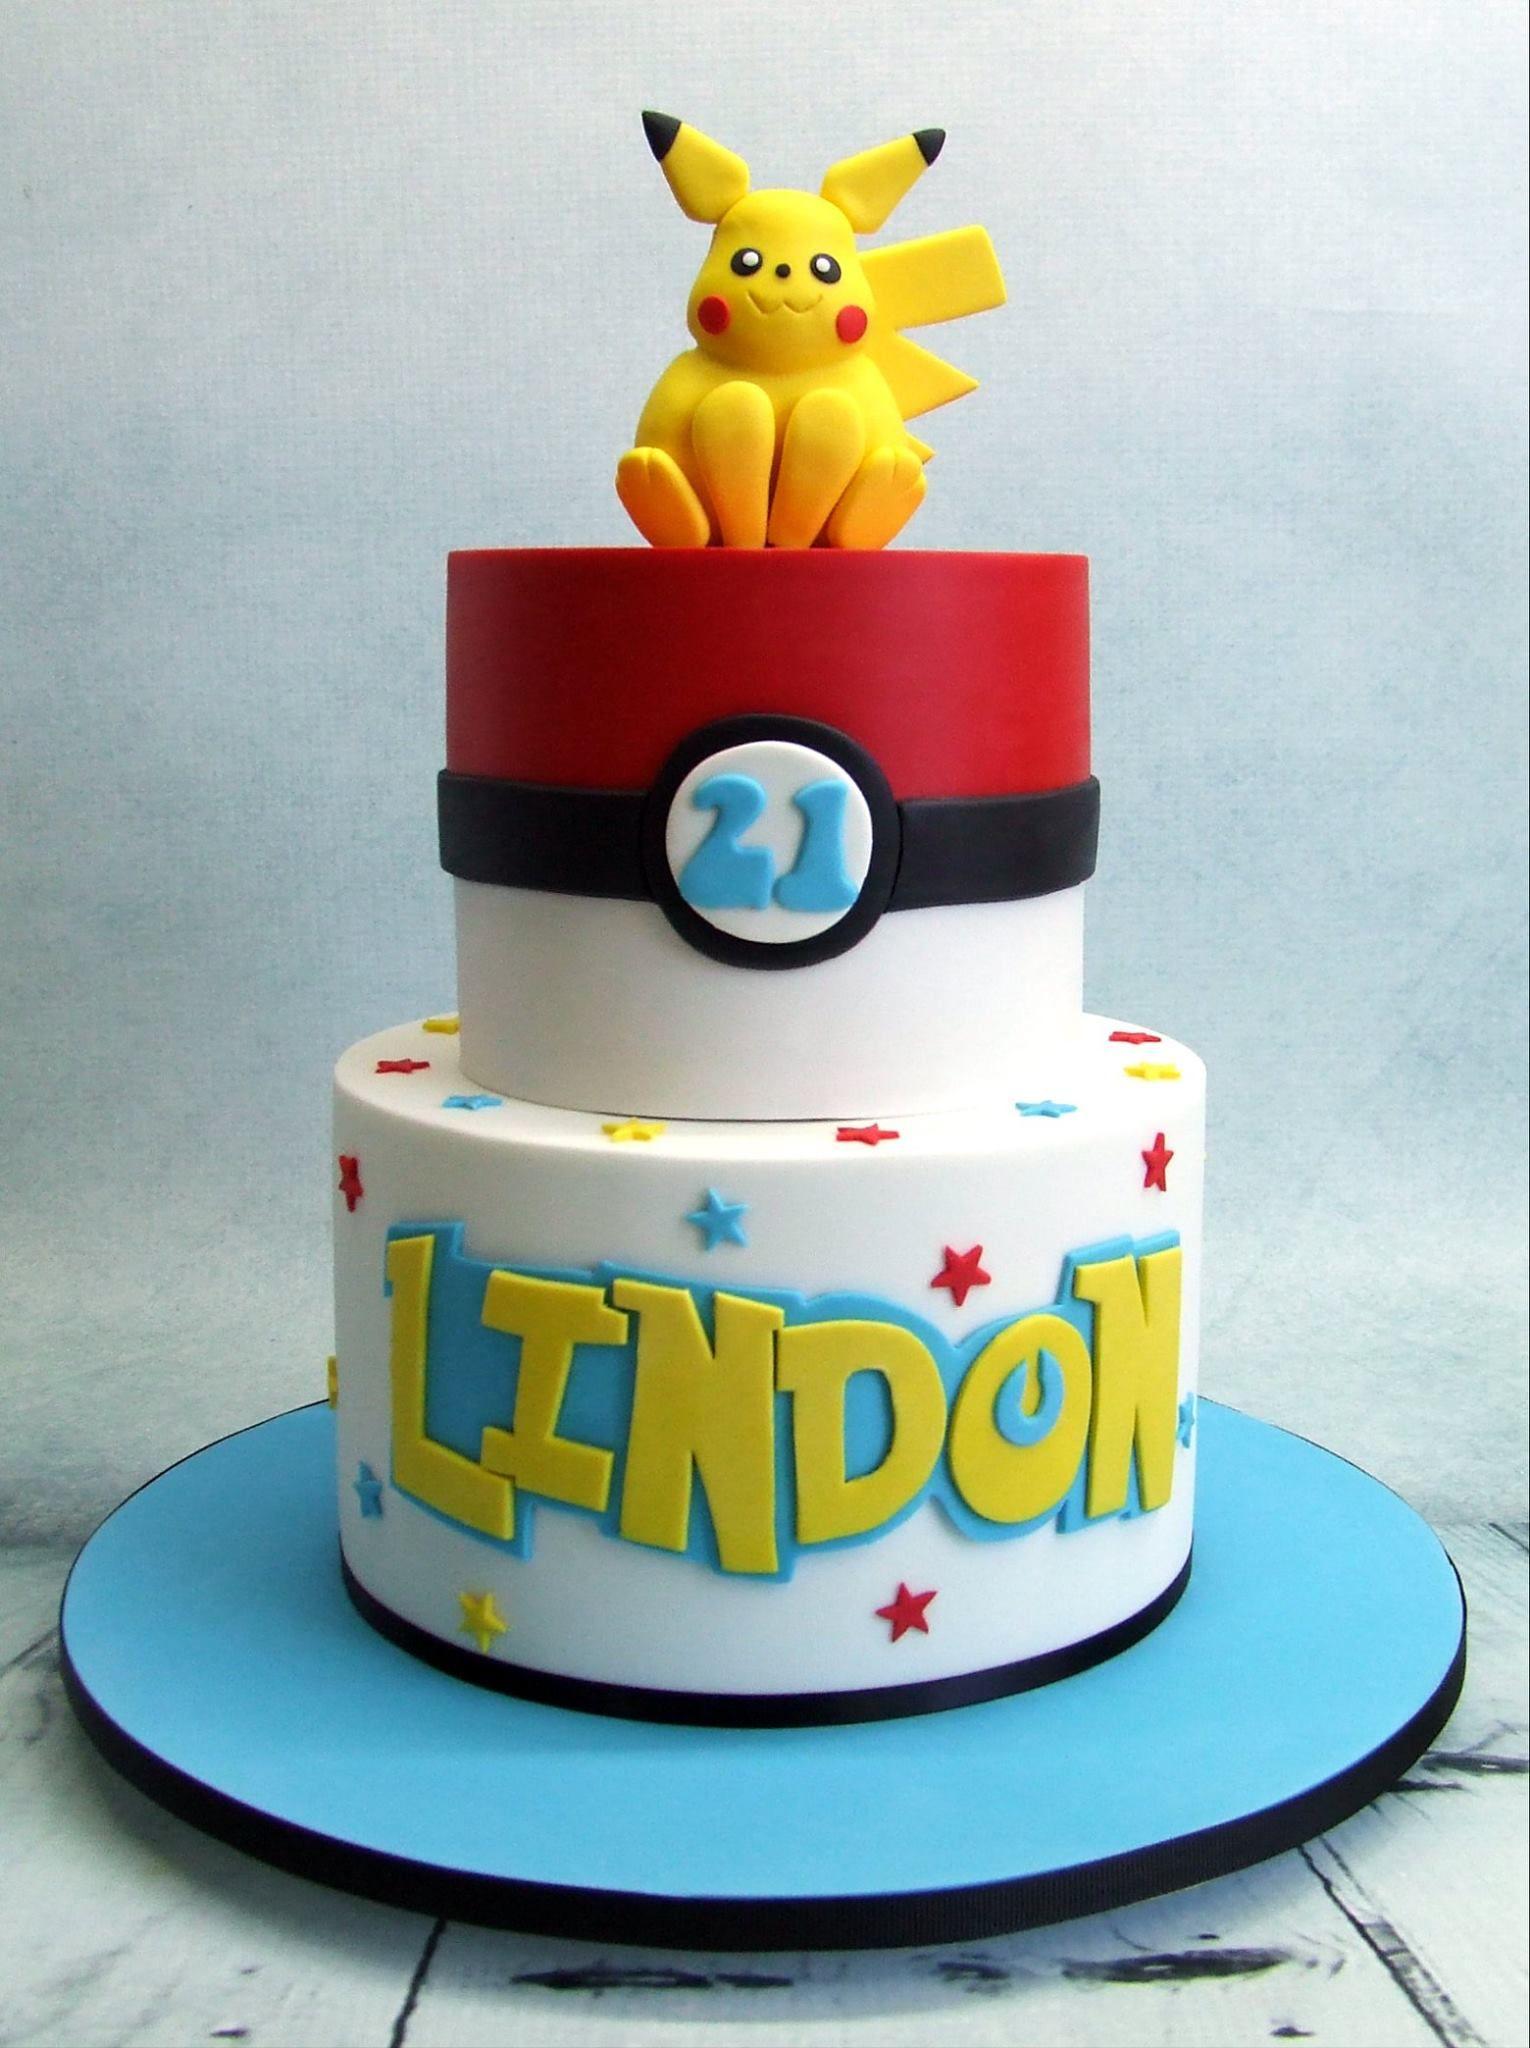 Happy Birthday Lindon Cake A Chance On Belinda Video Game - Video game birthday cake